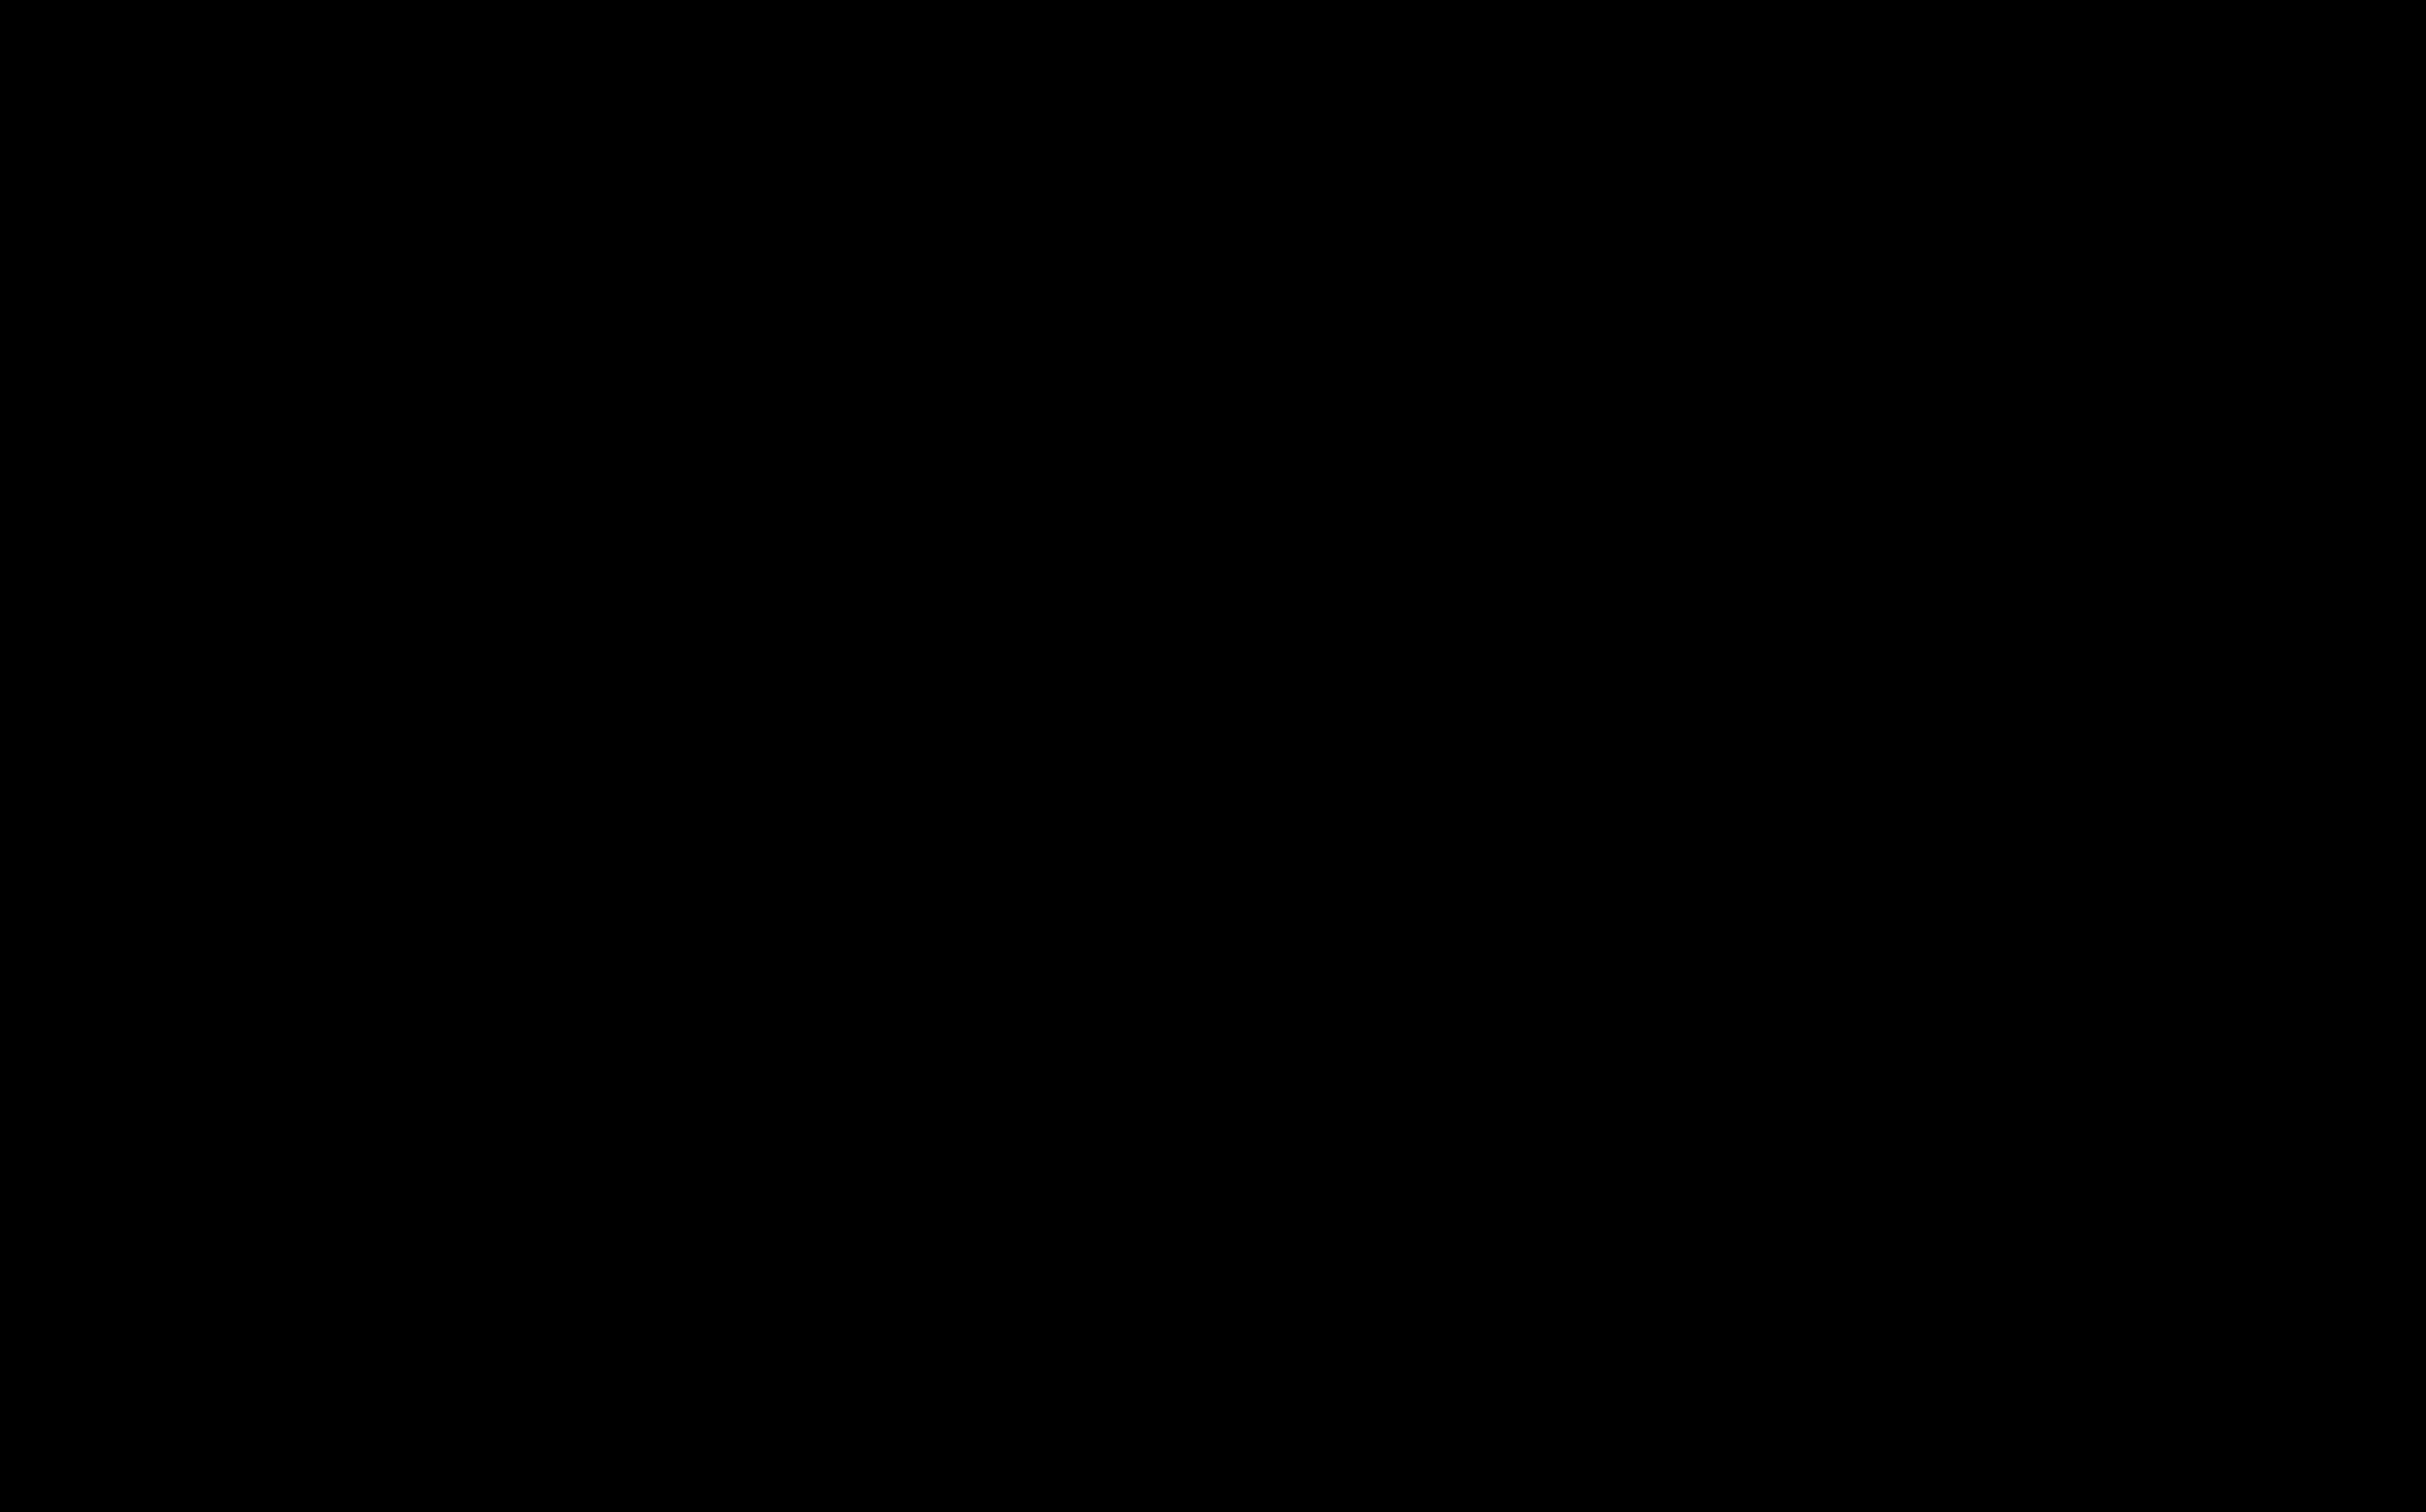 VIBROCONTROL 8000